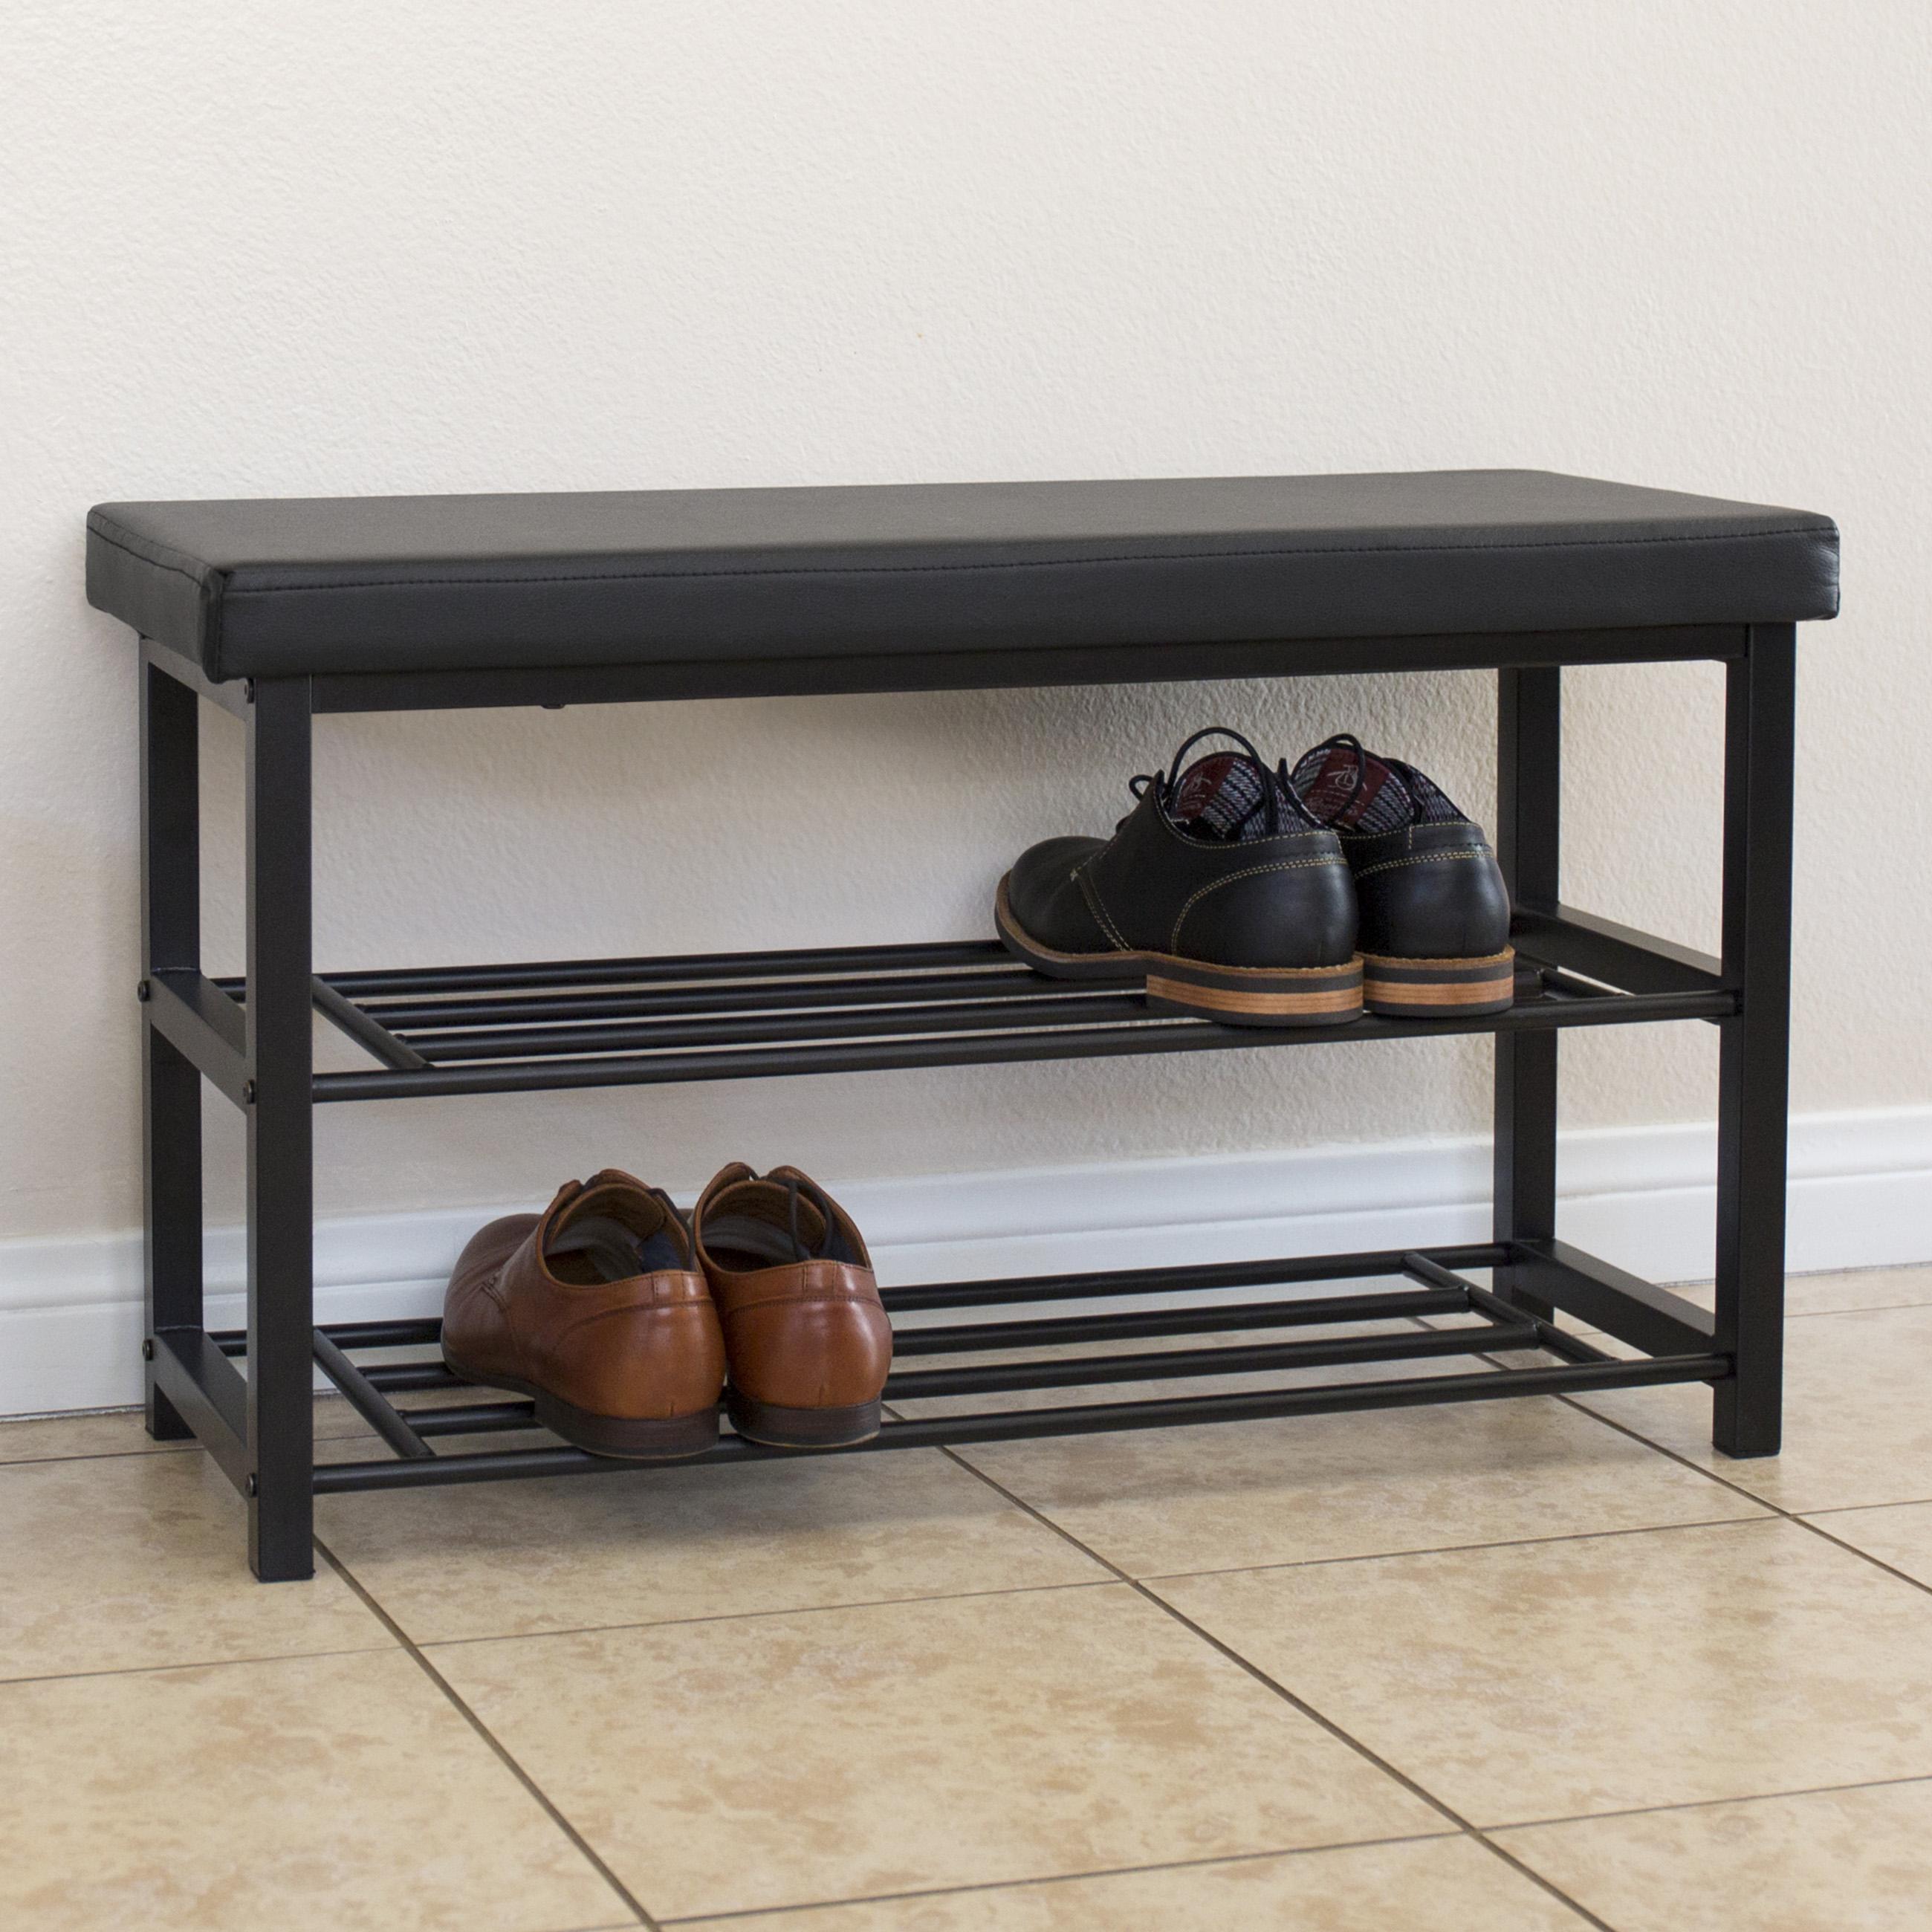 2 tier metal storage bench shoe rack organize w leather top black ebay. Black Bedroom Furniture Sets. Home Design Ideas